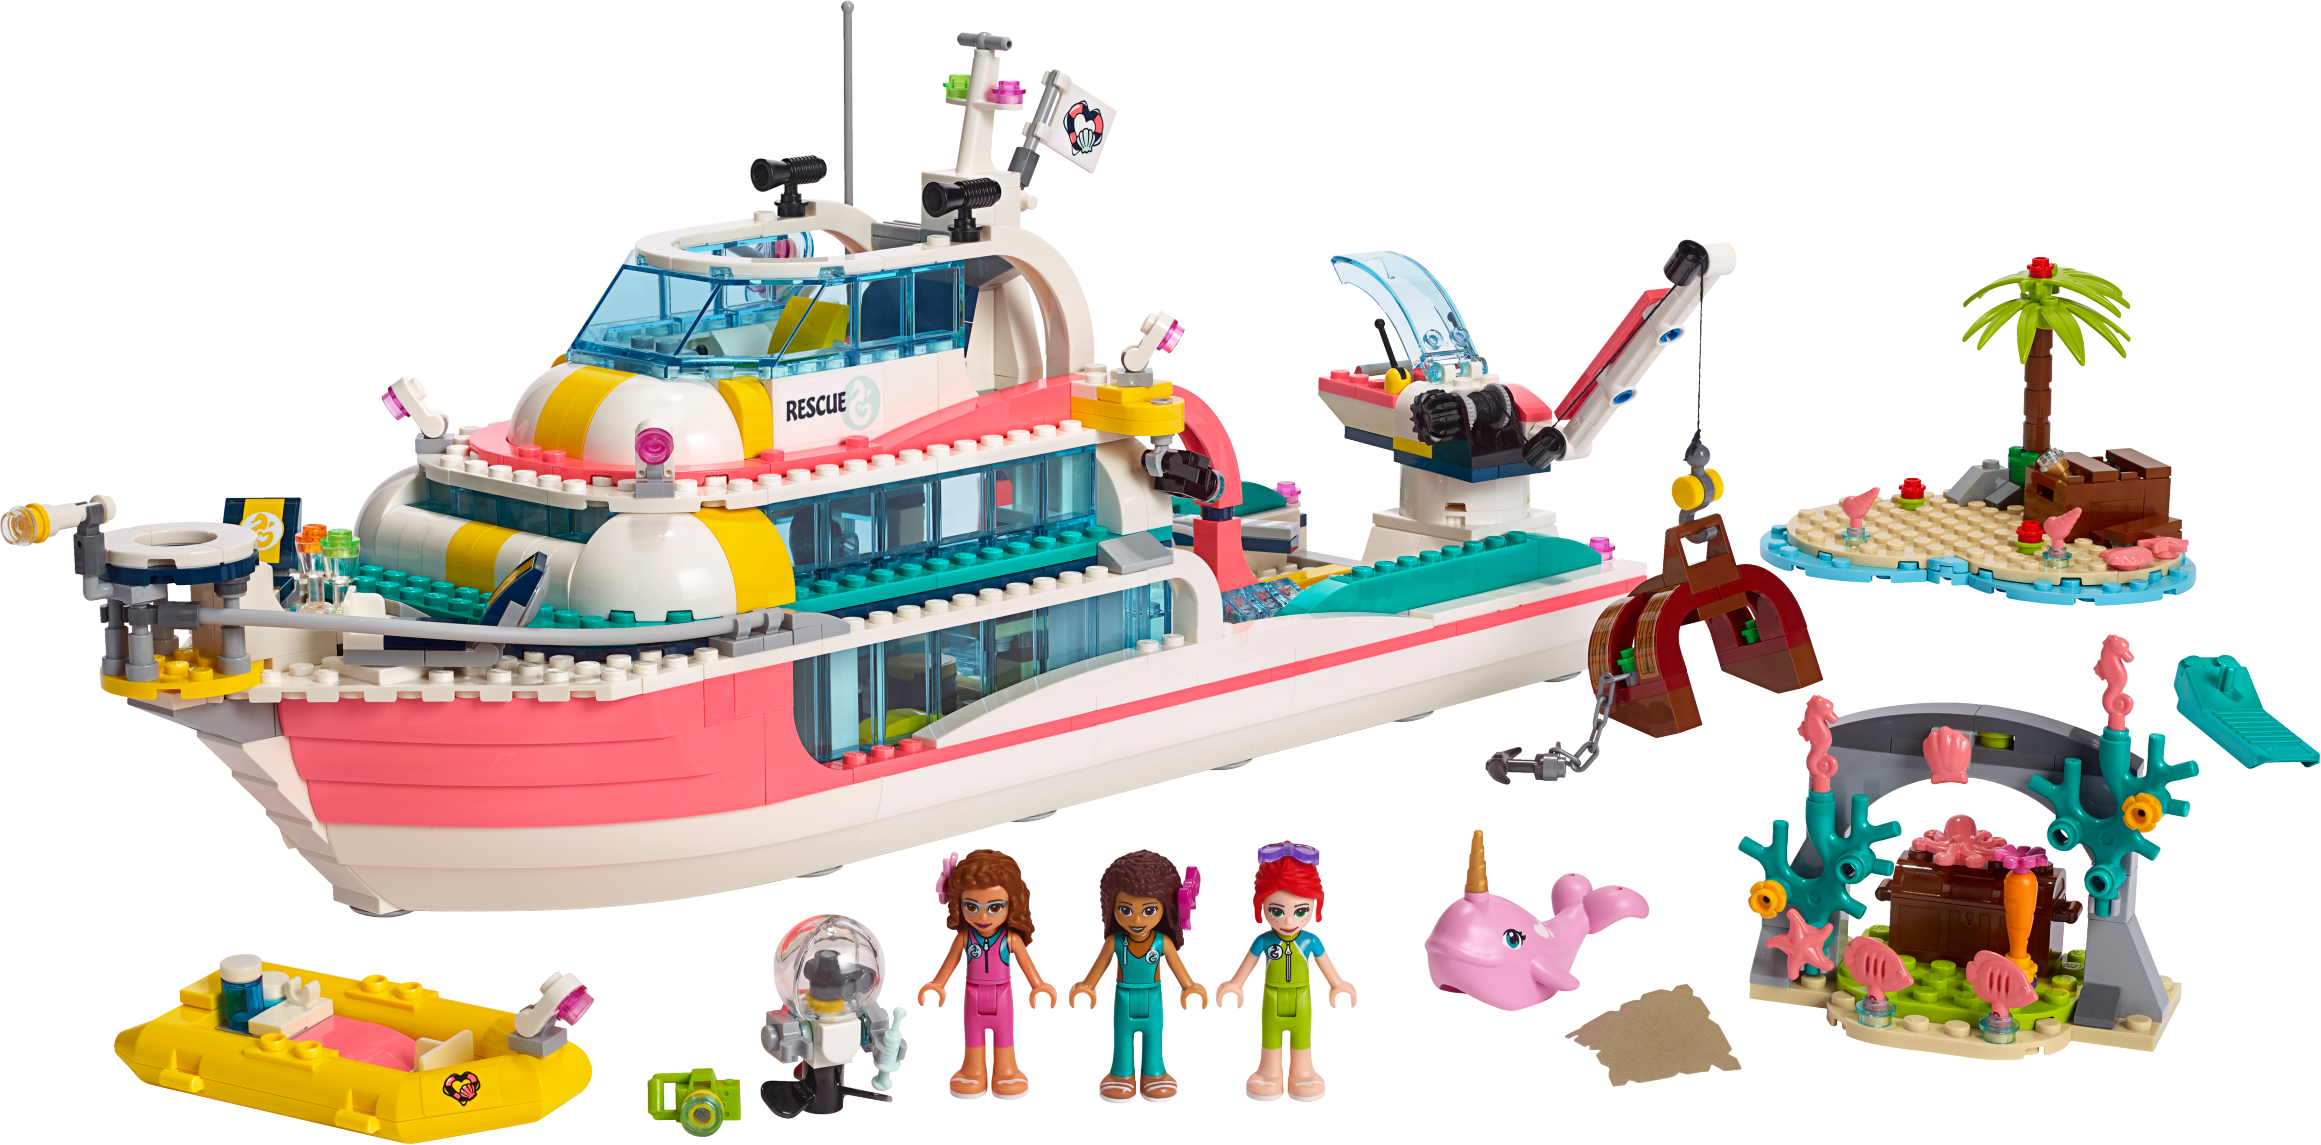 Rescue Mission Boat